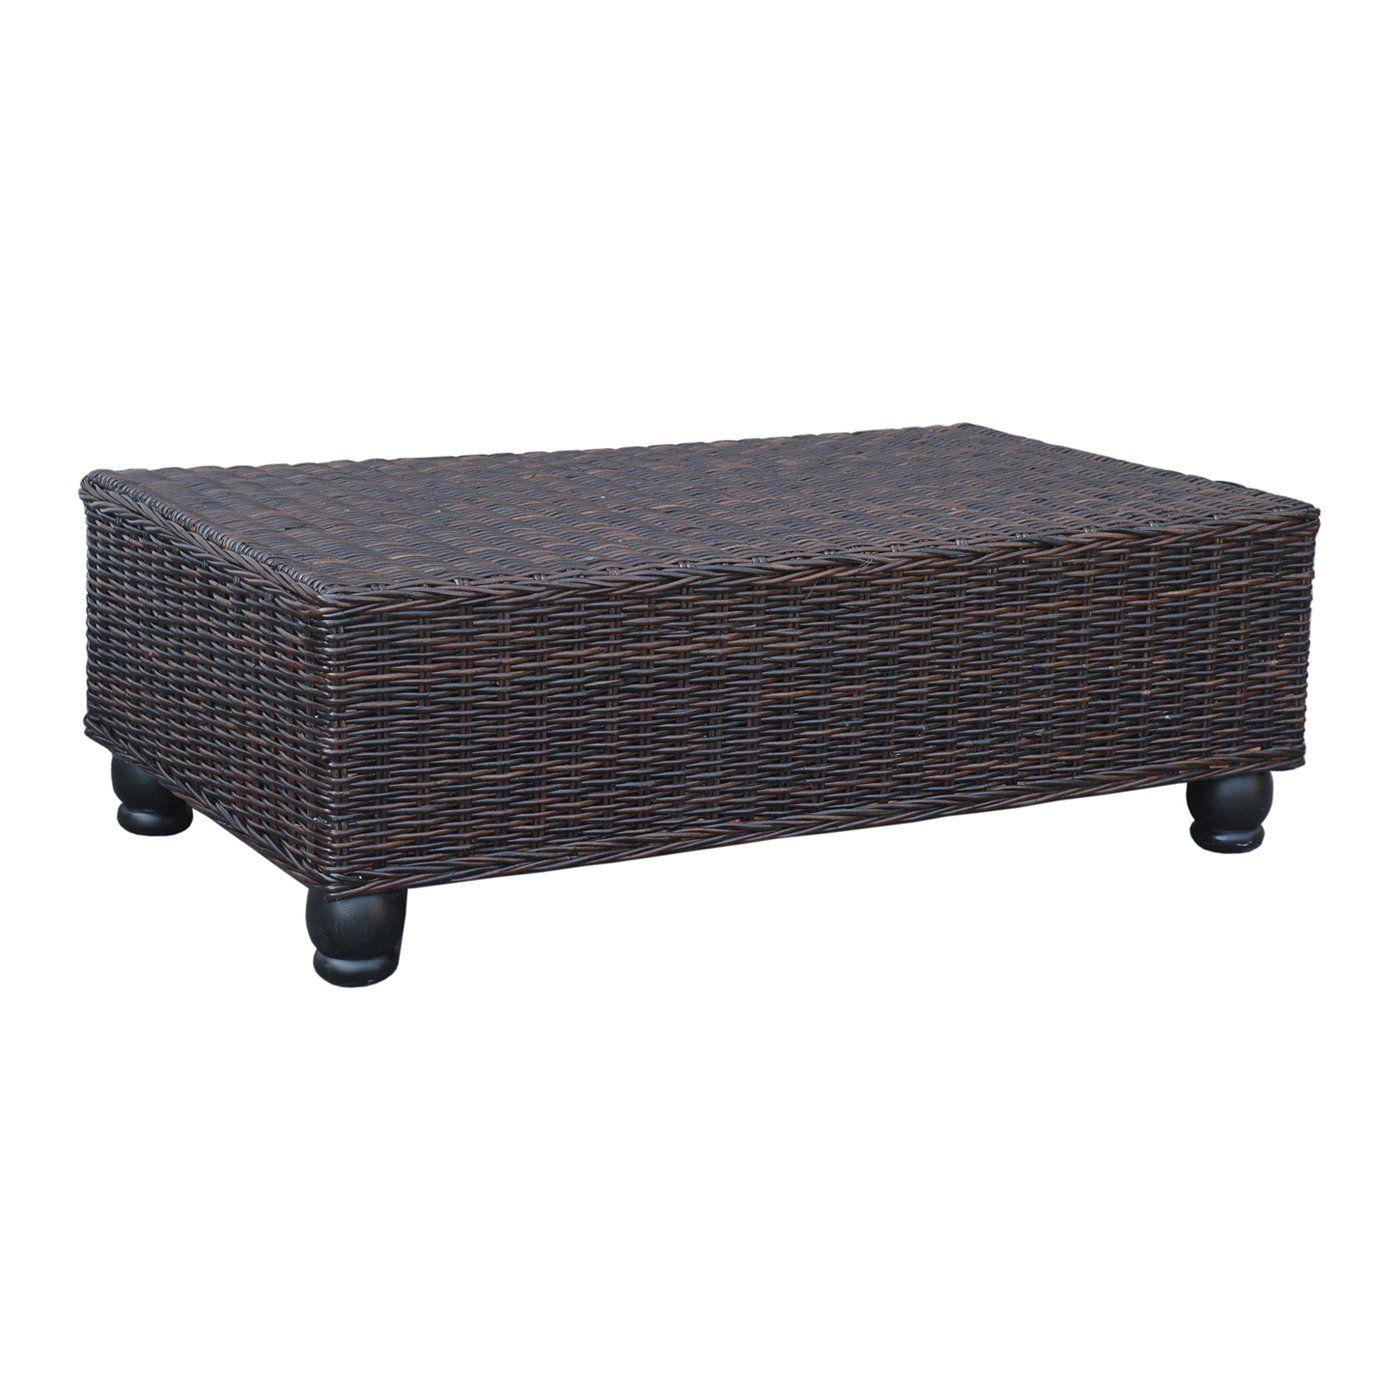 Attirant Jeffan International JV AMV401 Amava Coffee Table   Home Furniture Showroom